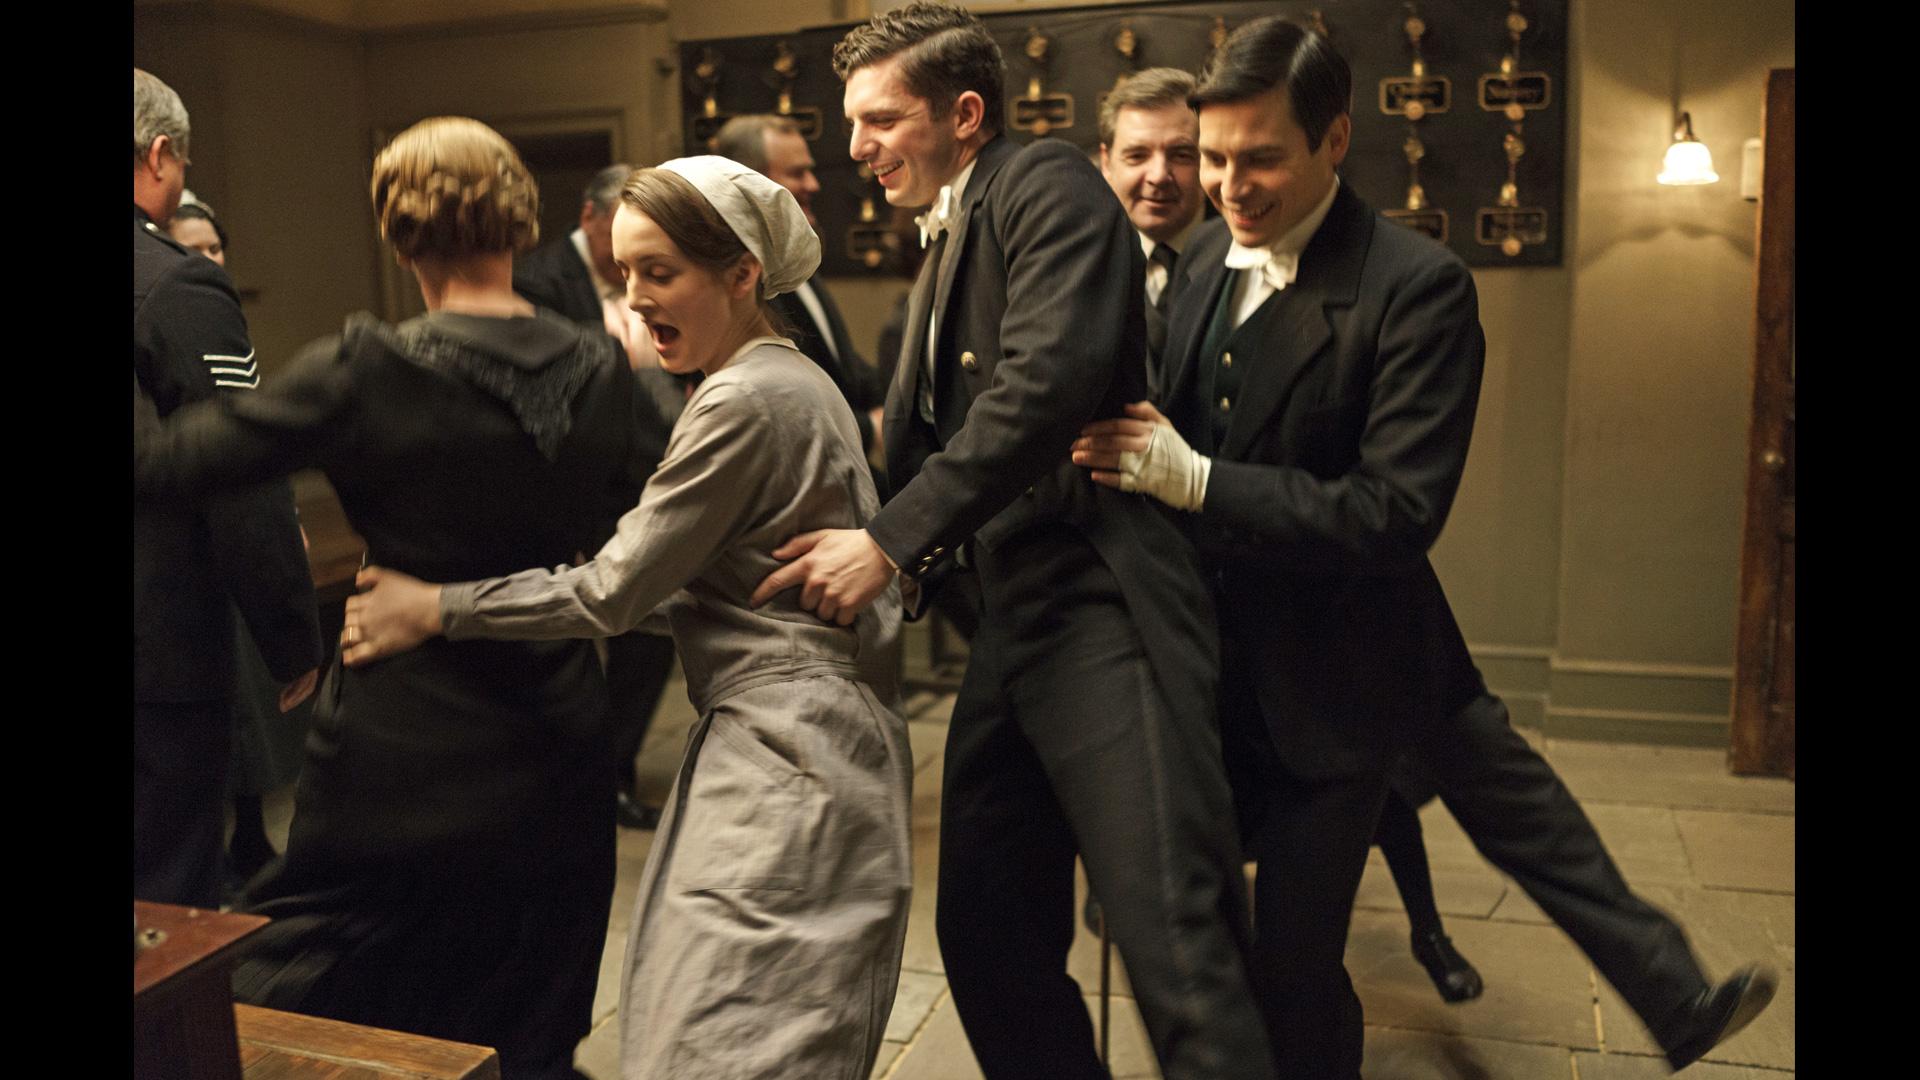 downton abbey season 6 episode 1 behind the scenes 1 episode 1